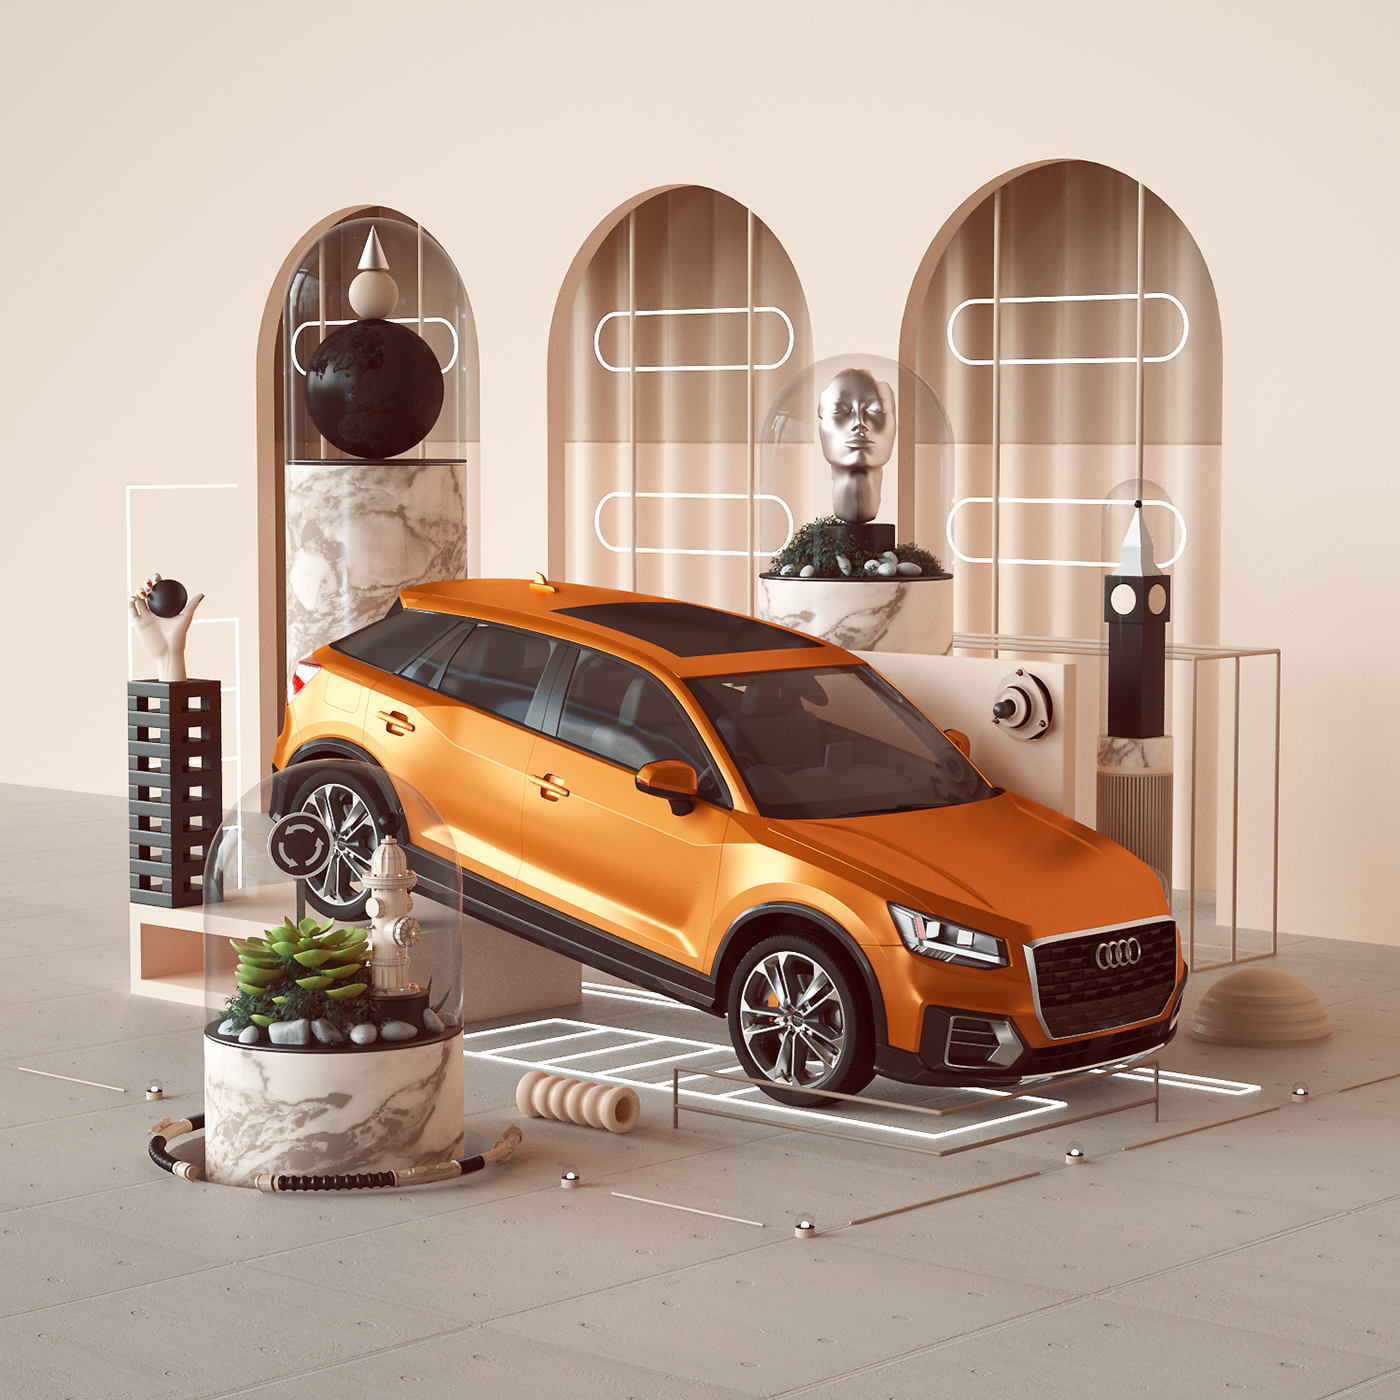 AUDI Qriosity On Behance - Audi q 745 car